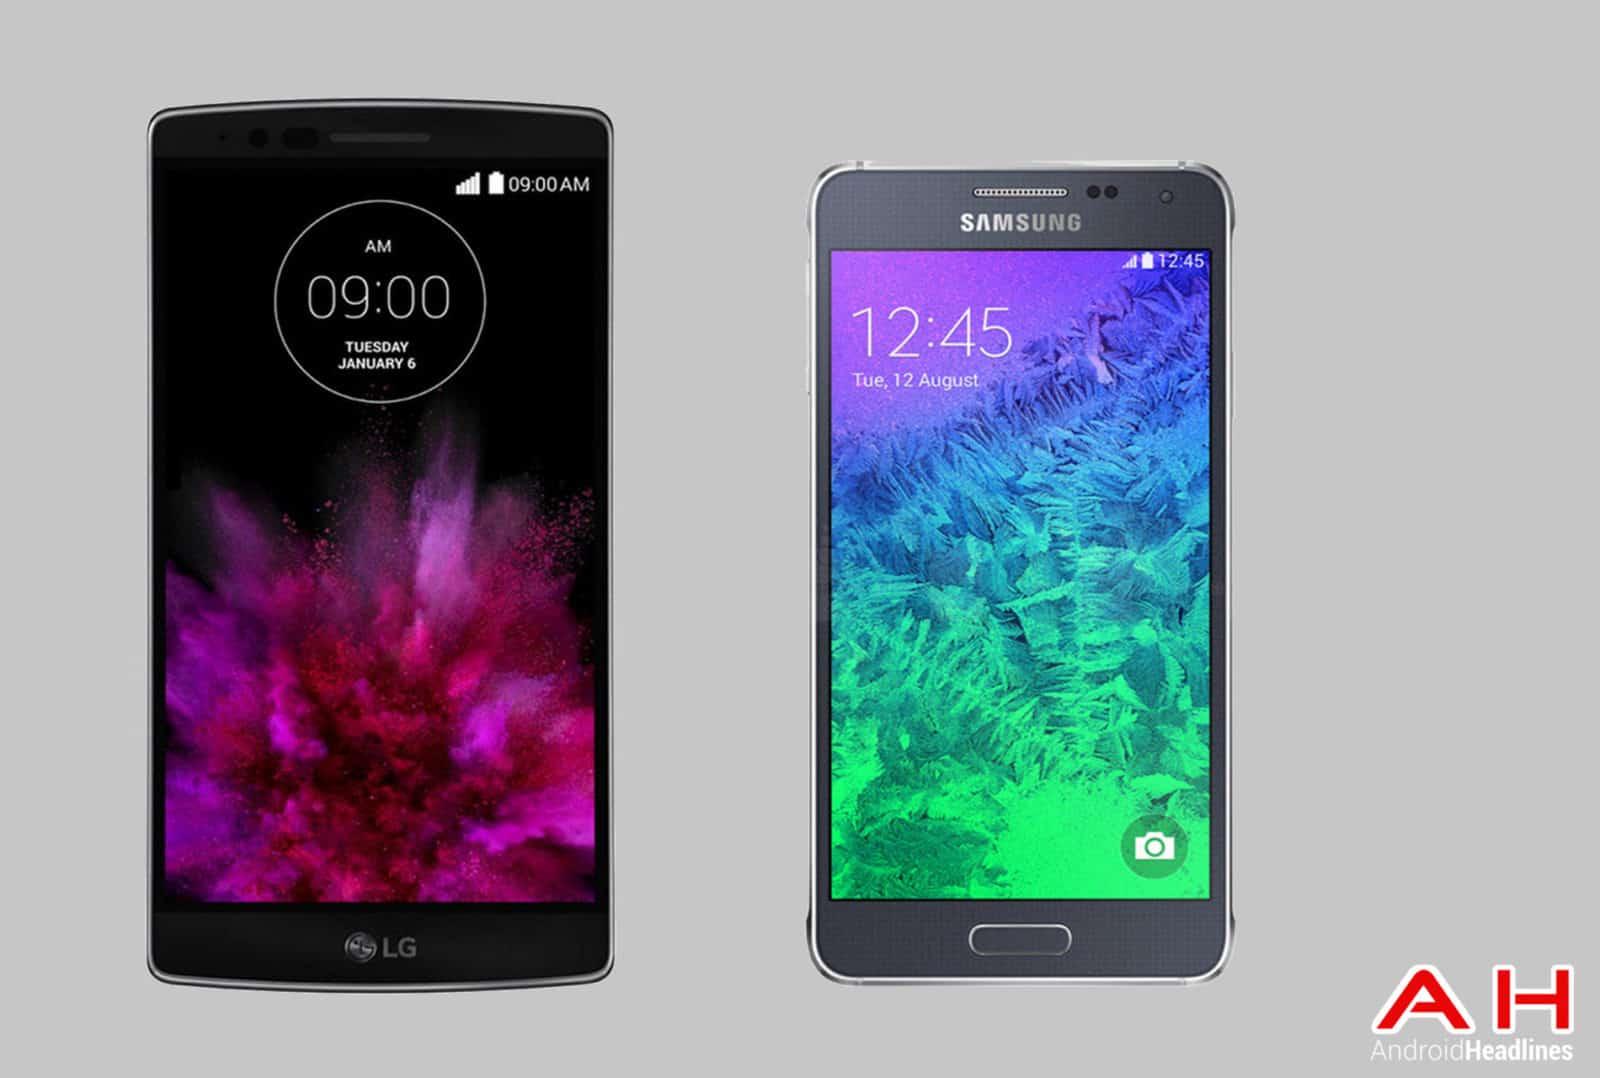 LG G Flex 2 vs Galaxy Alpha cam AH